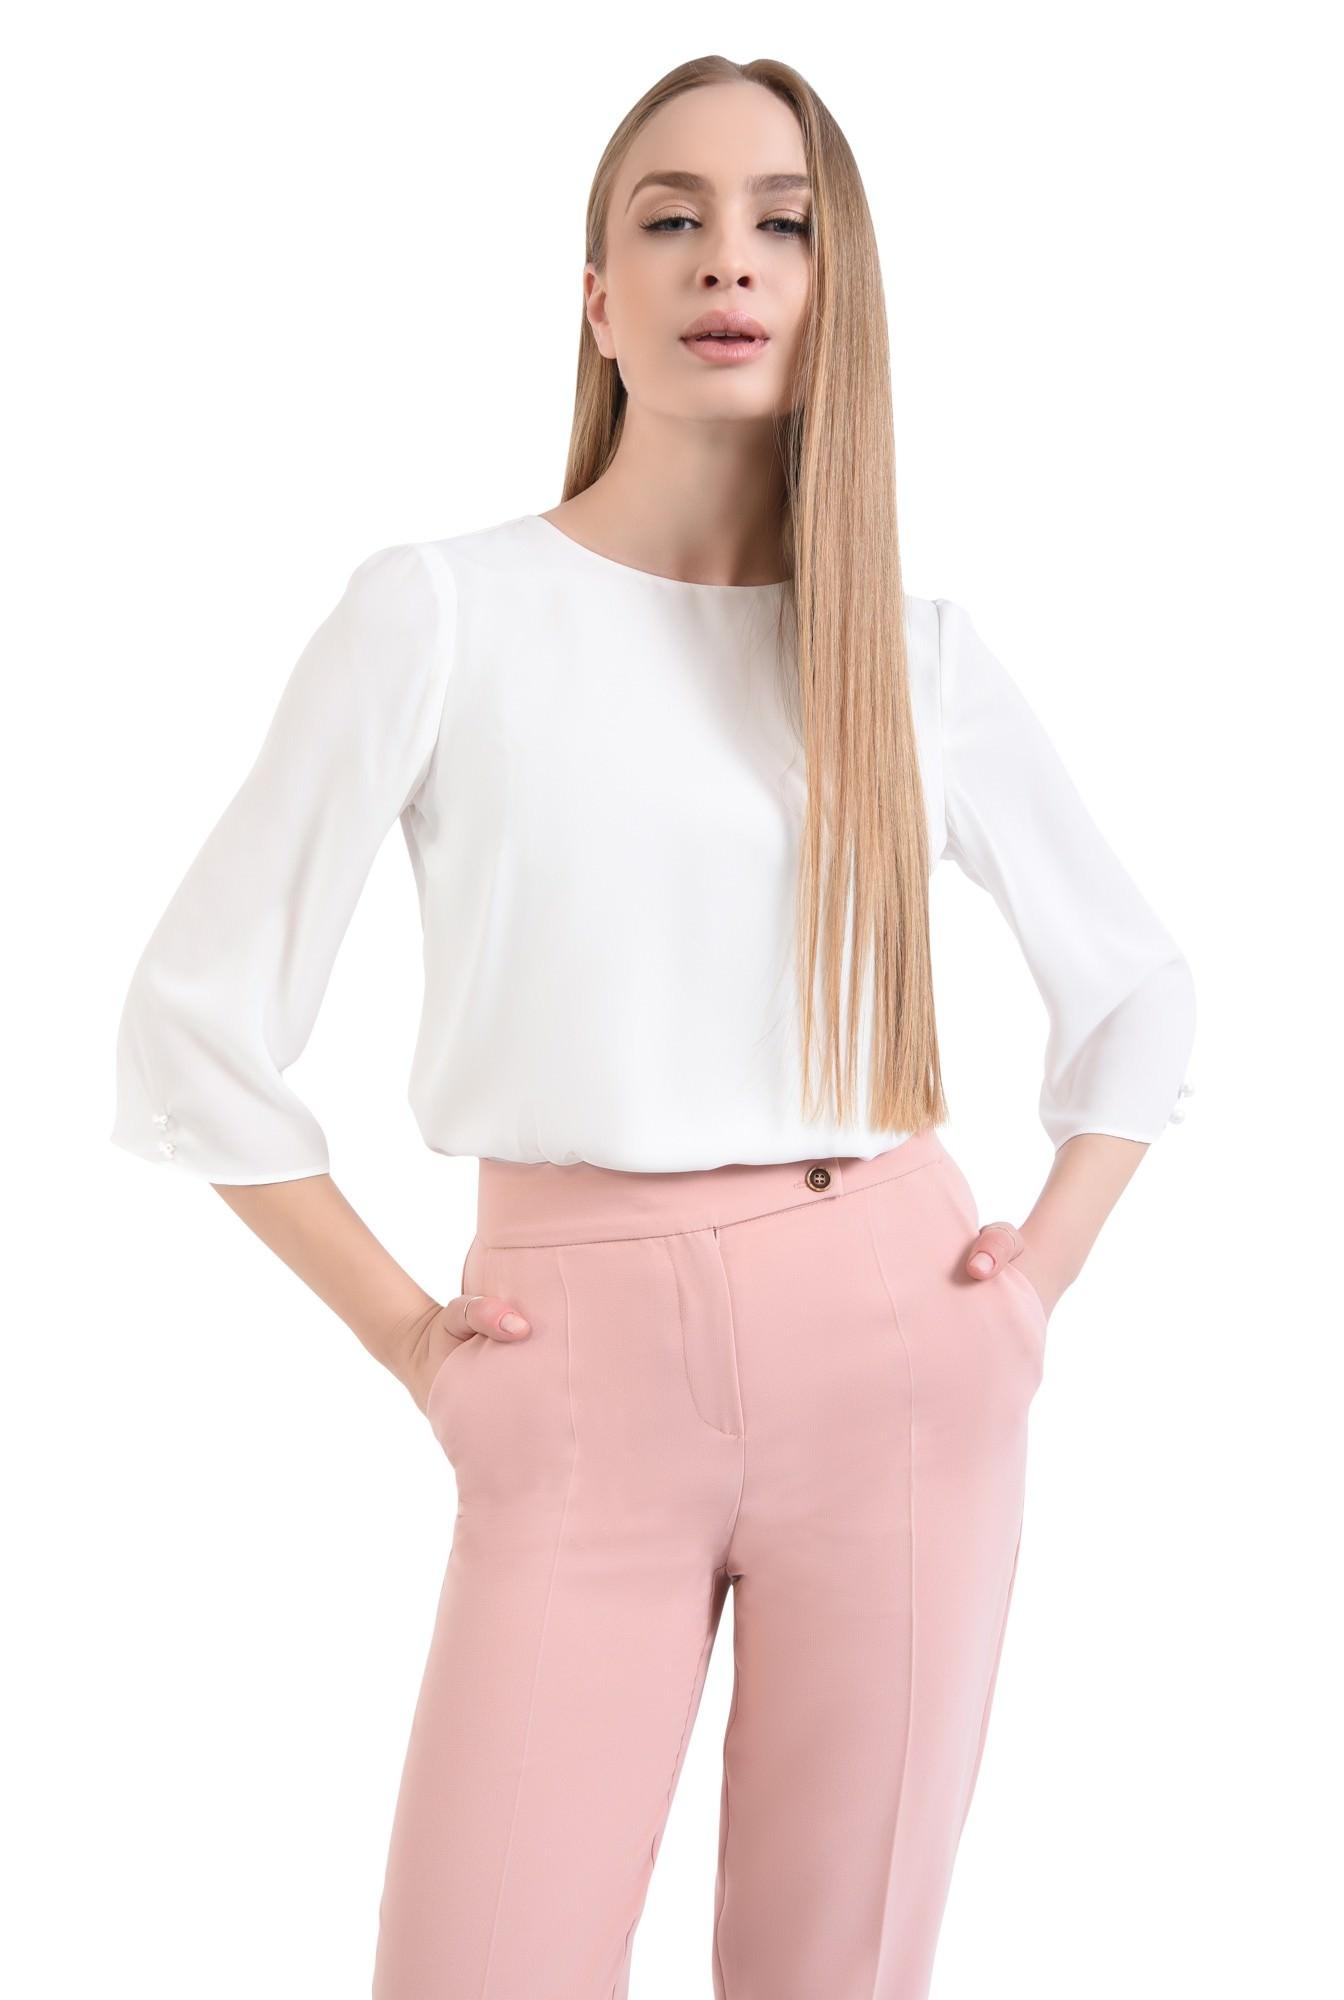 0 - Bluza casual, alb, nasturi decorativi